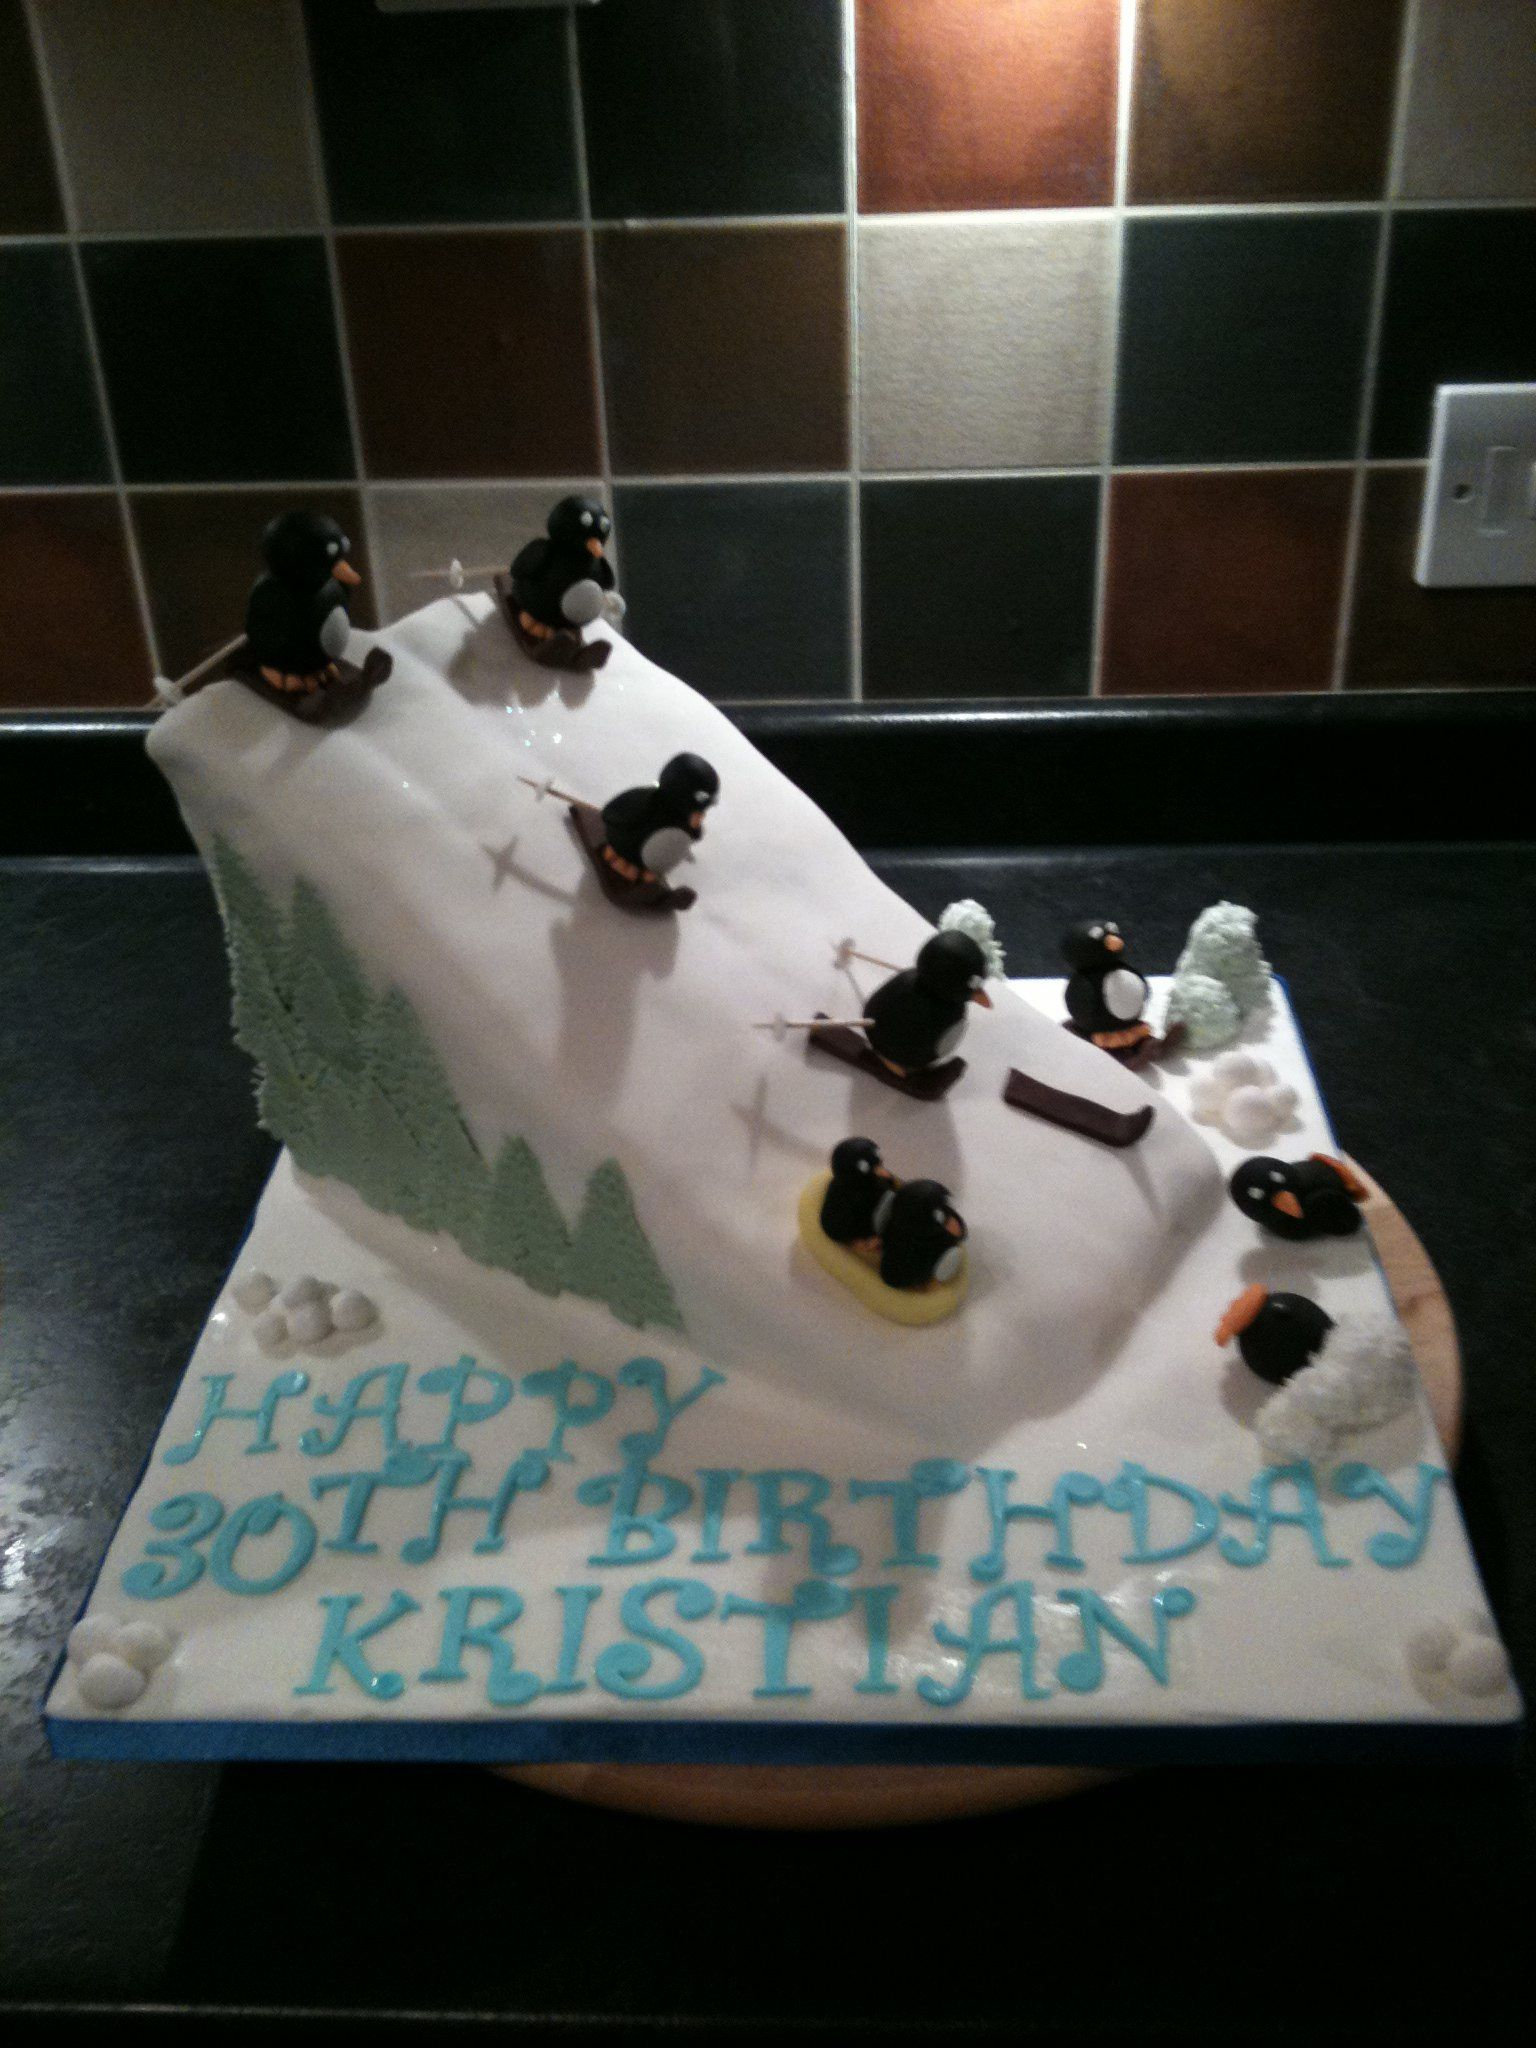 Penguin Ski And Snowboarding Slope Cake The Best Of Both Worlds